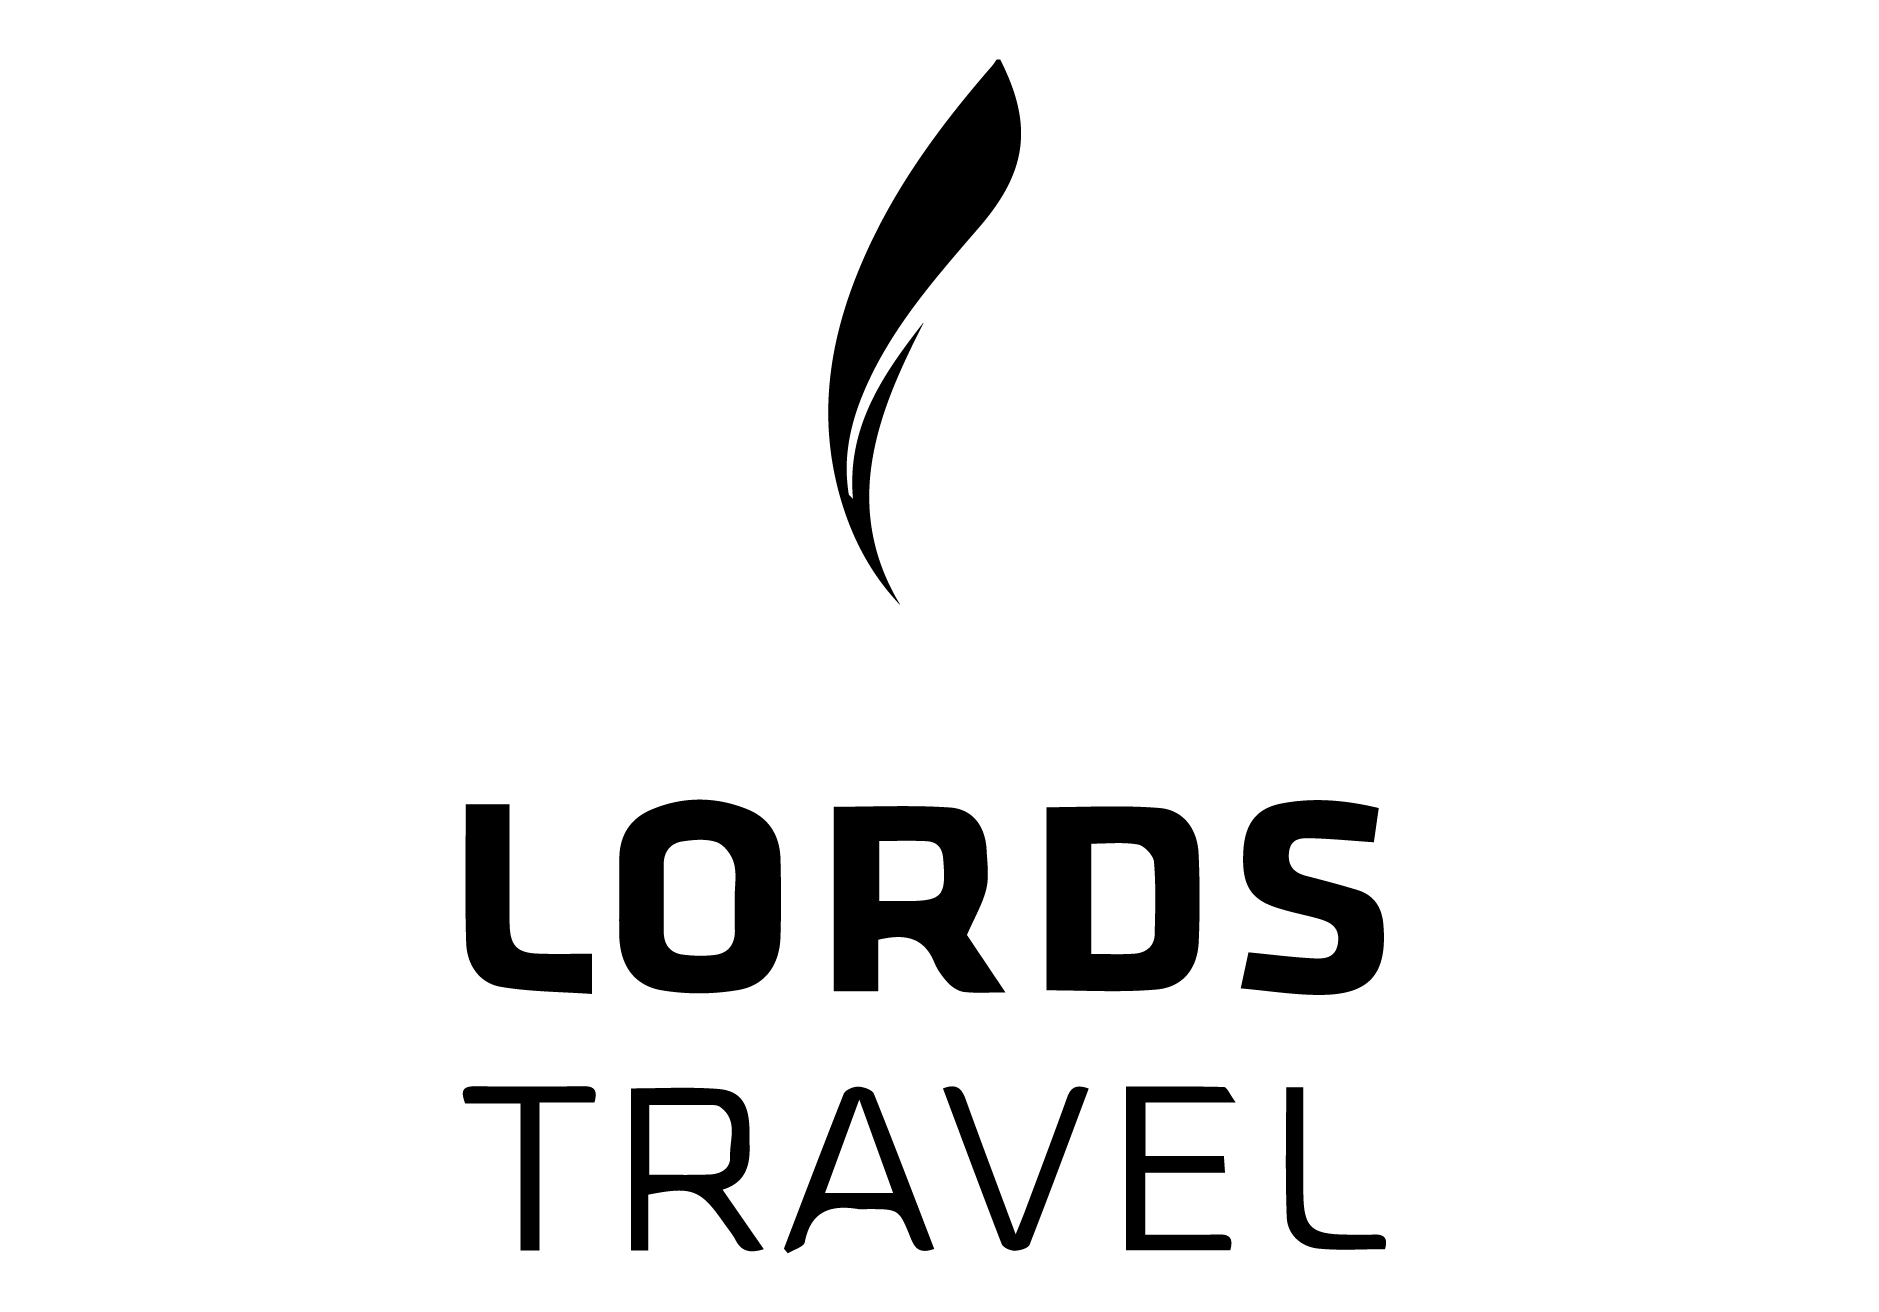 lordstravel_logo